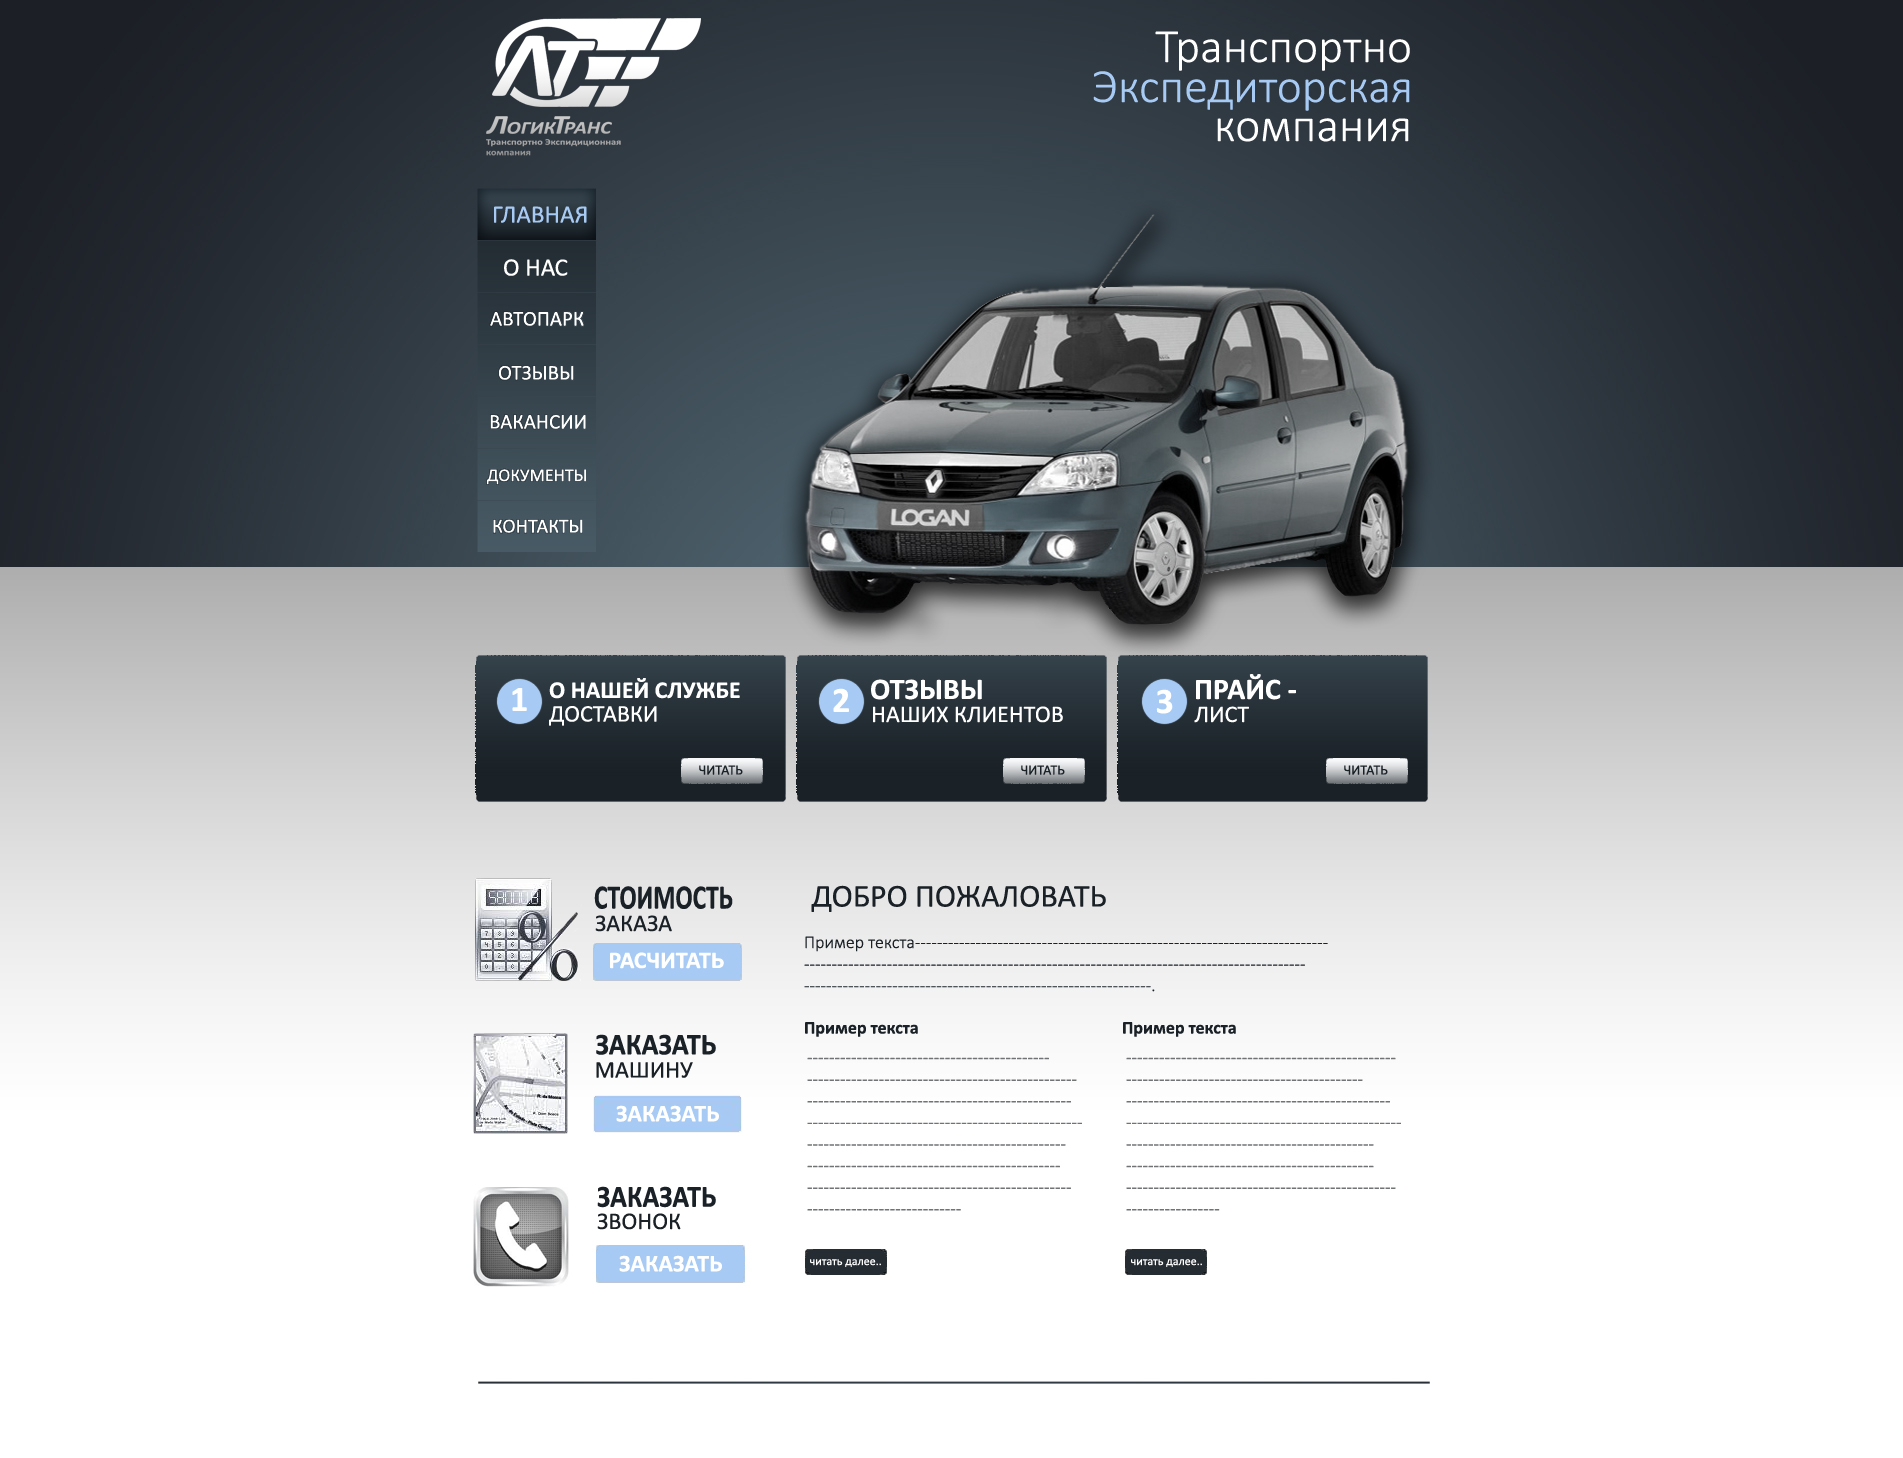 Дизайн сайта транспортно-экспедиторской компании ЛогикТранс фото f_6665a4792fc5649b.jpg